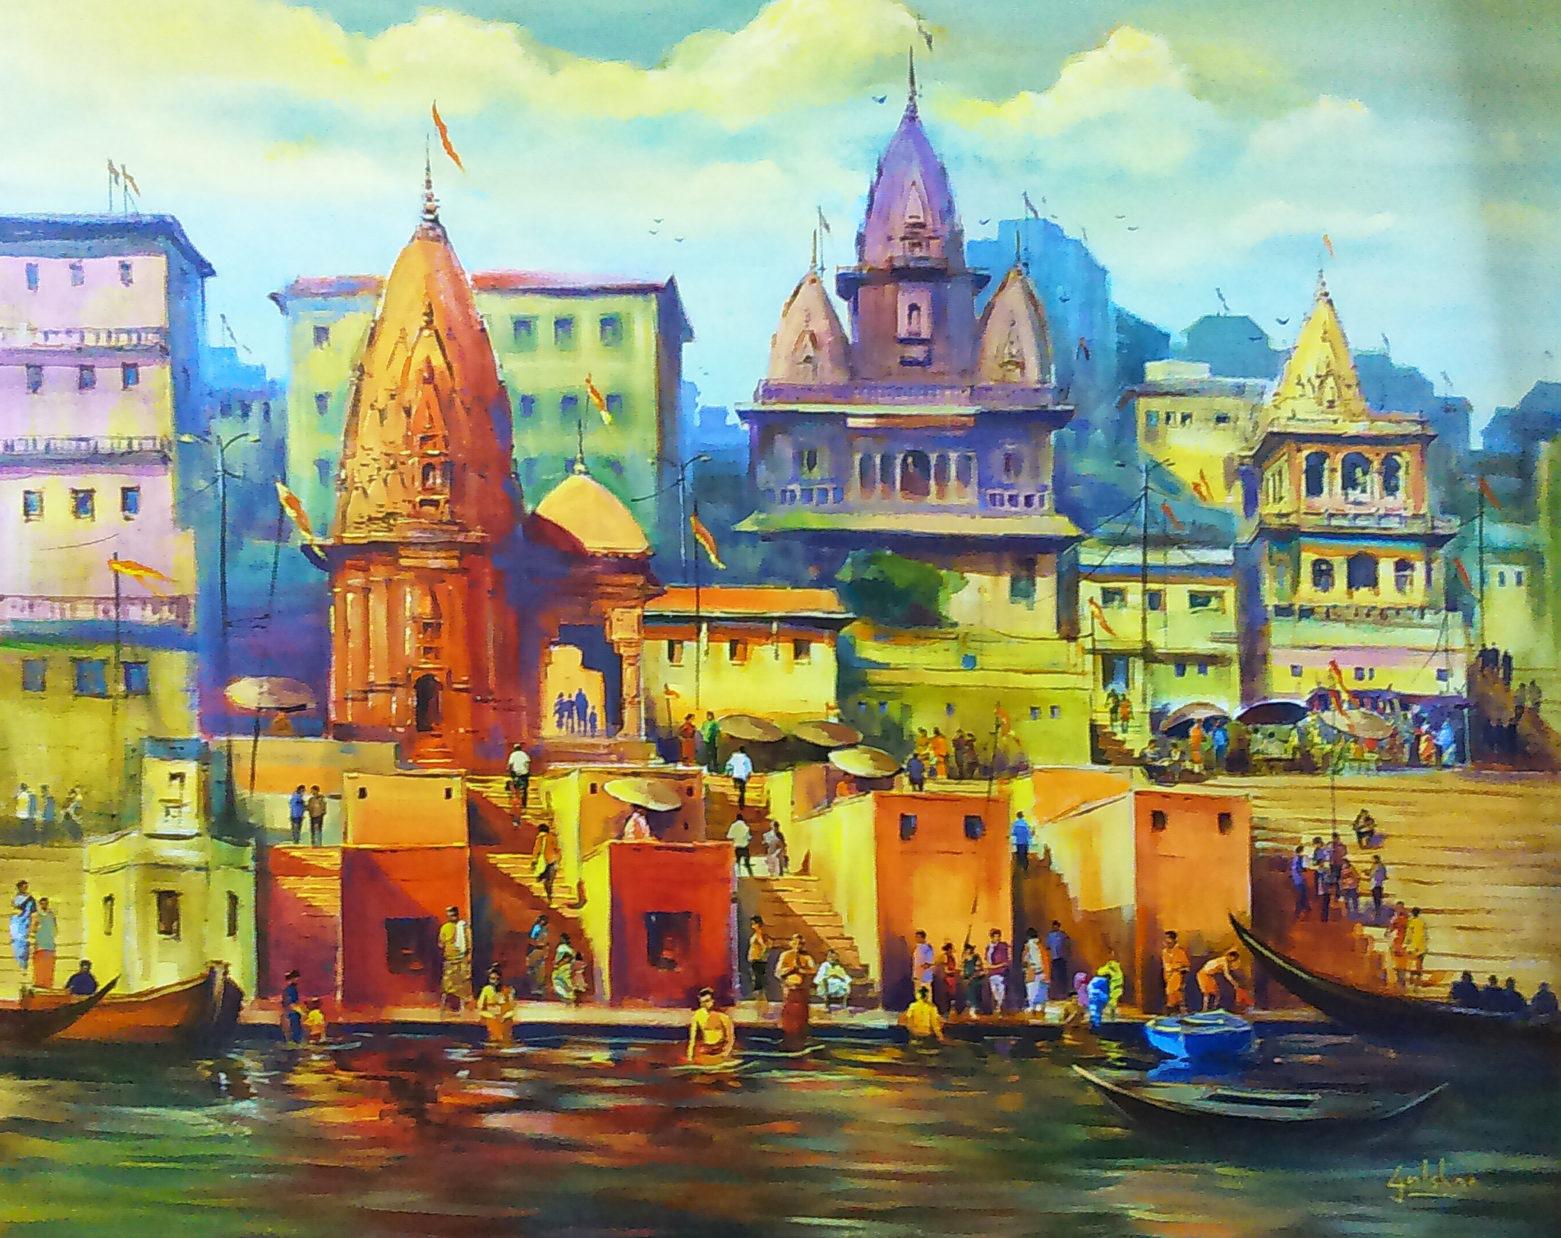 The Mystical Banaras Ghats